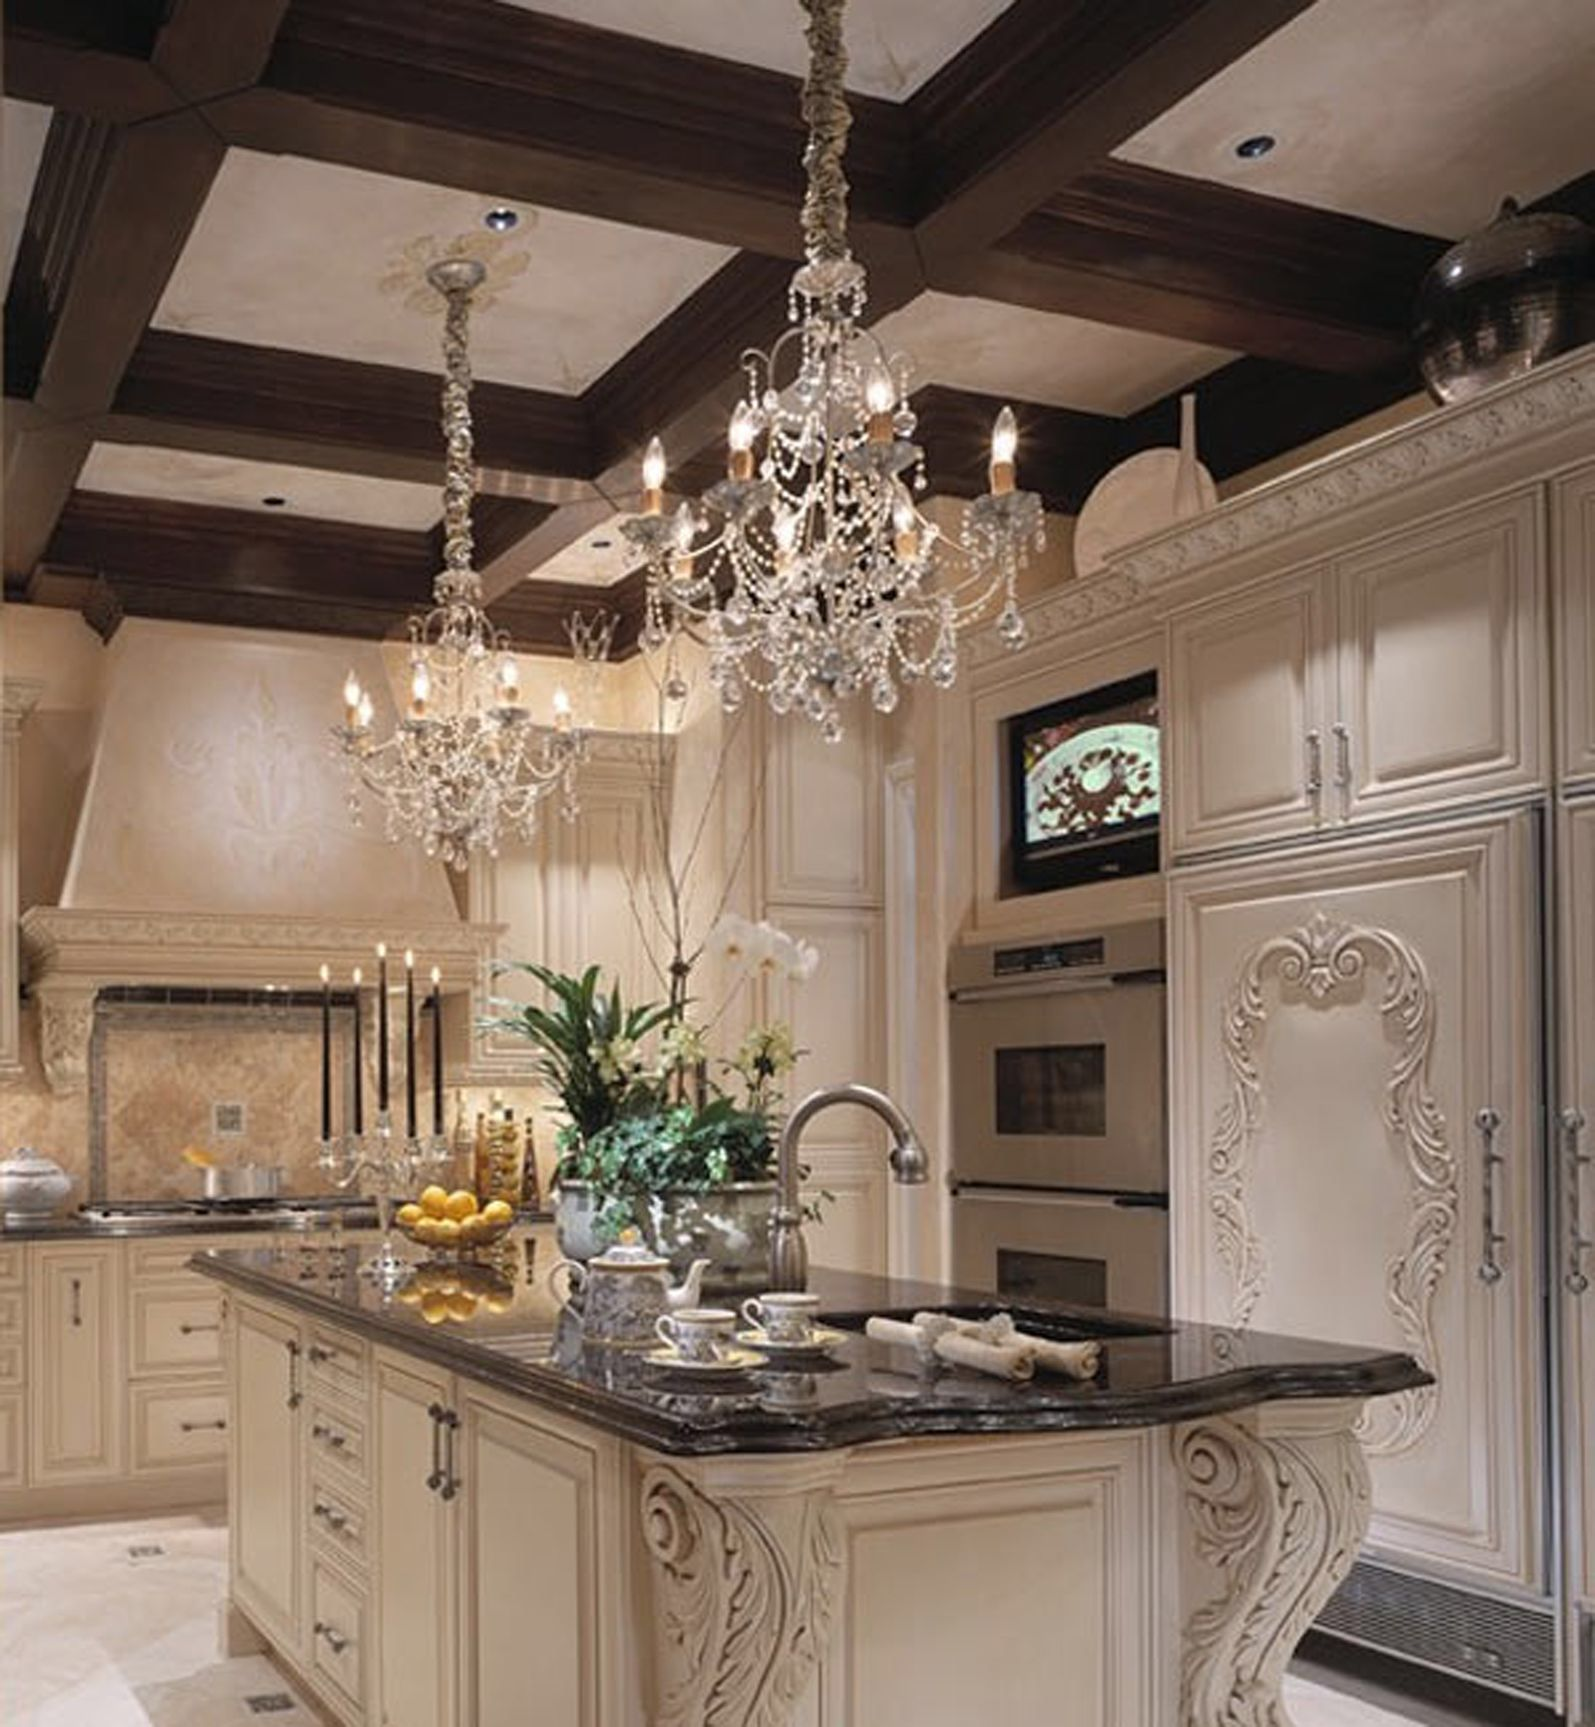 elegance traditional kitchen design custom kitchens design elegant kitchens on kitchen ideas elegant id=62262